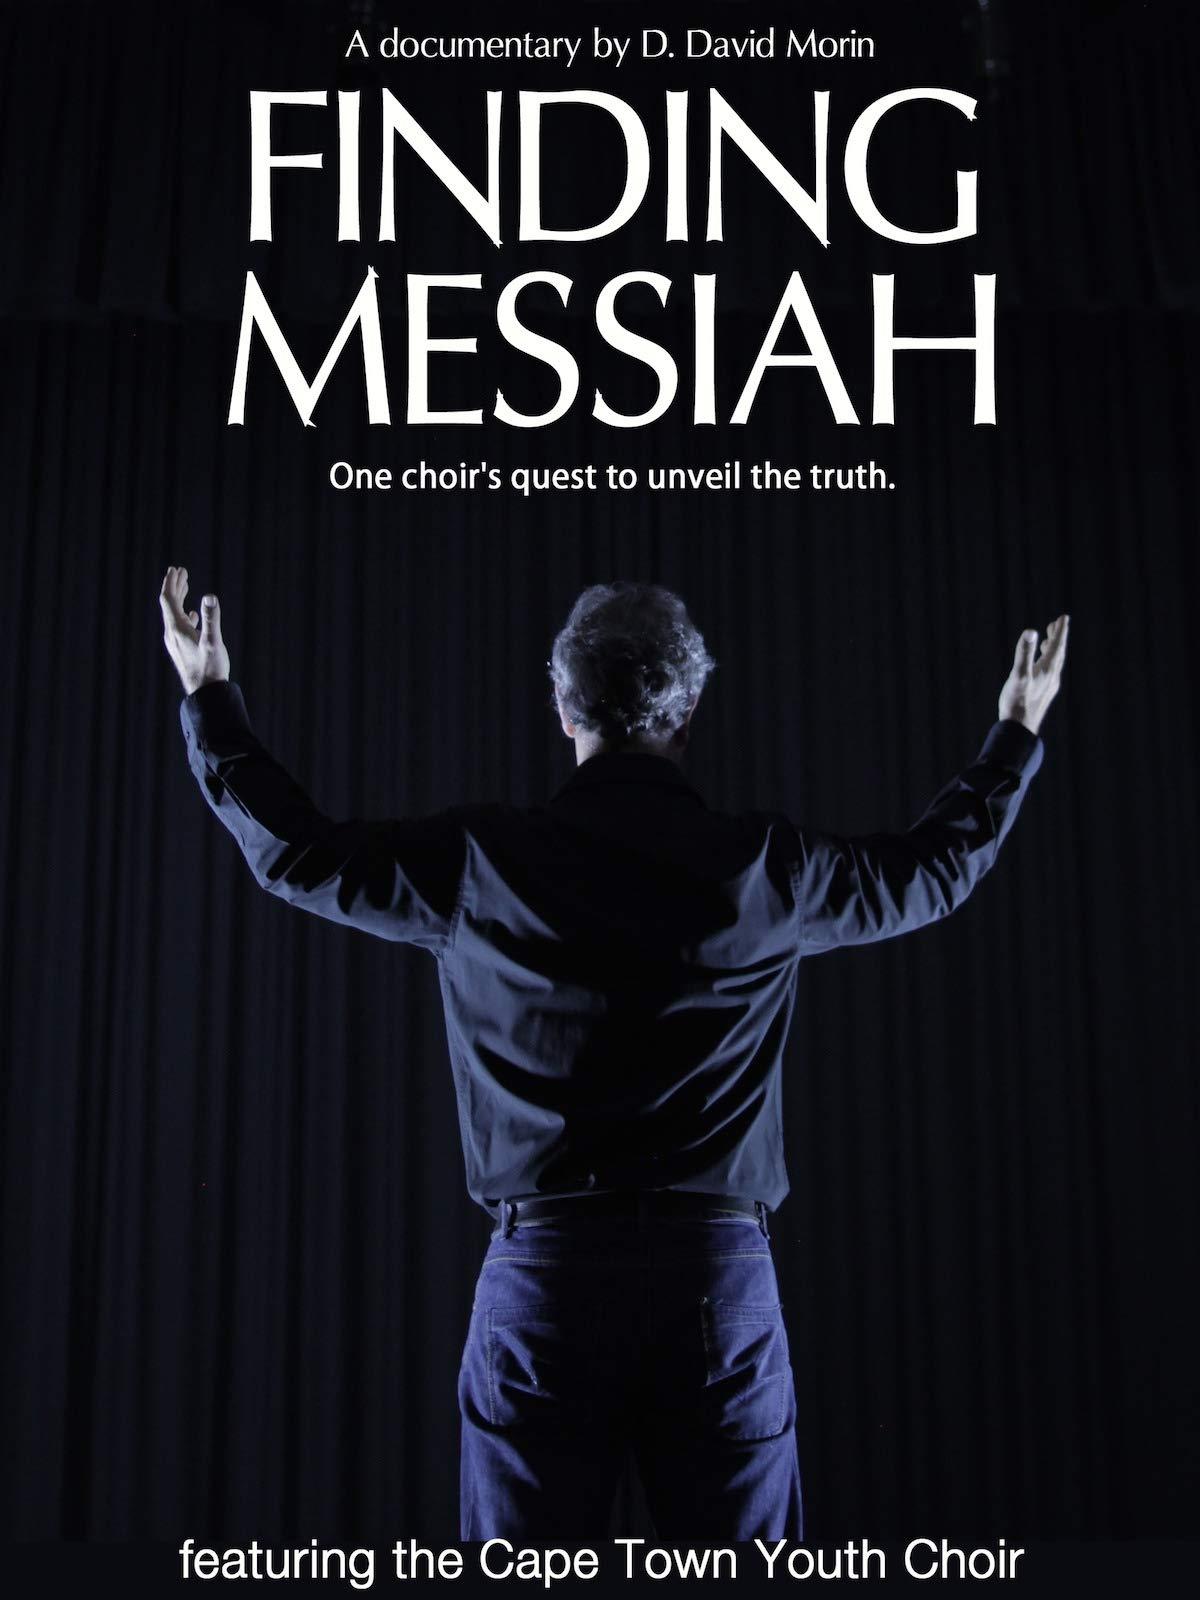 Finding Messiah